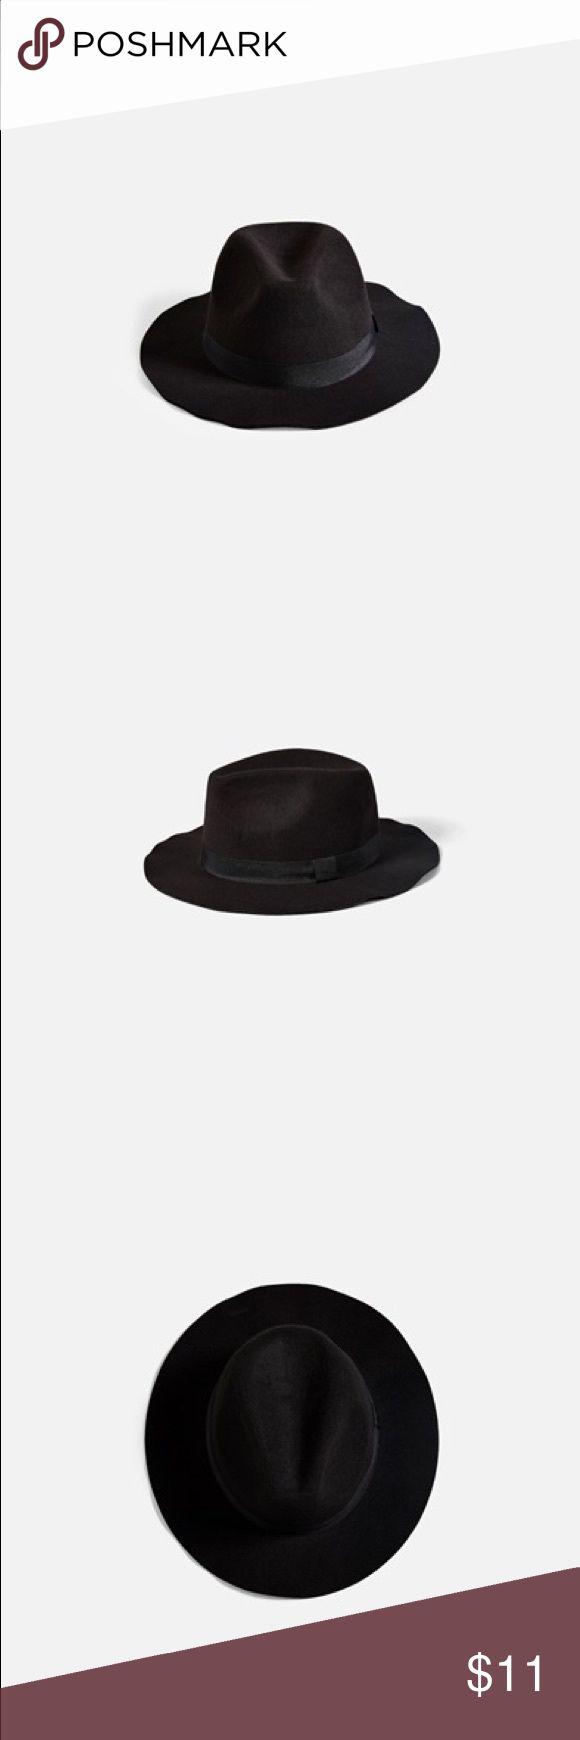 Black Fedora Hat Black Fedora Hat from BikBok. Onesize. BikBok Accessories Hats